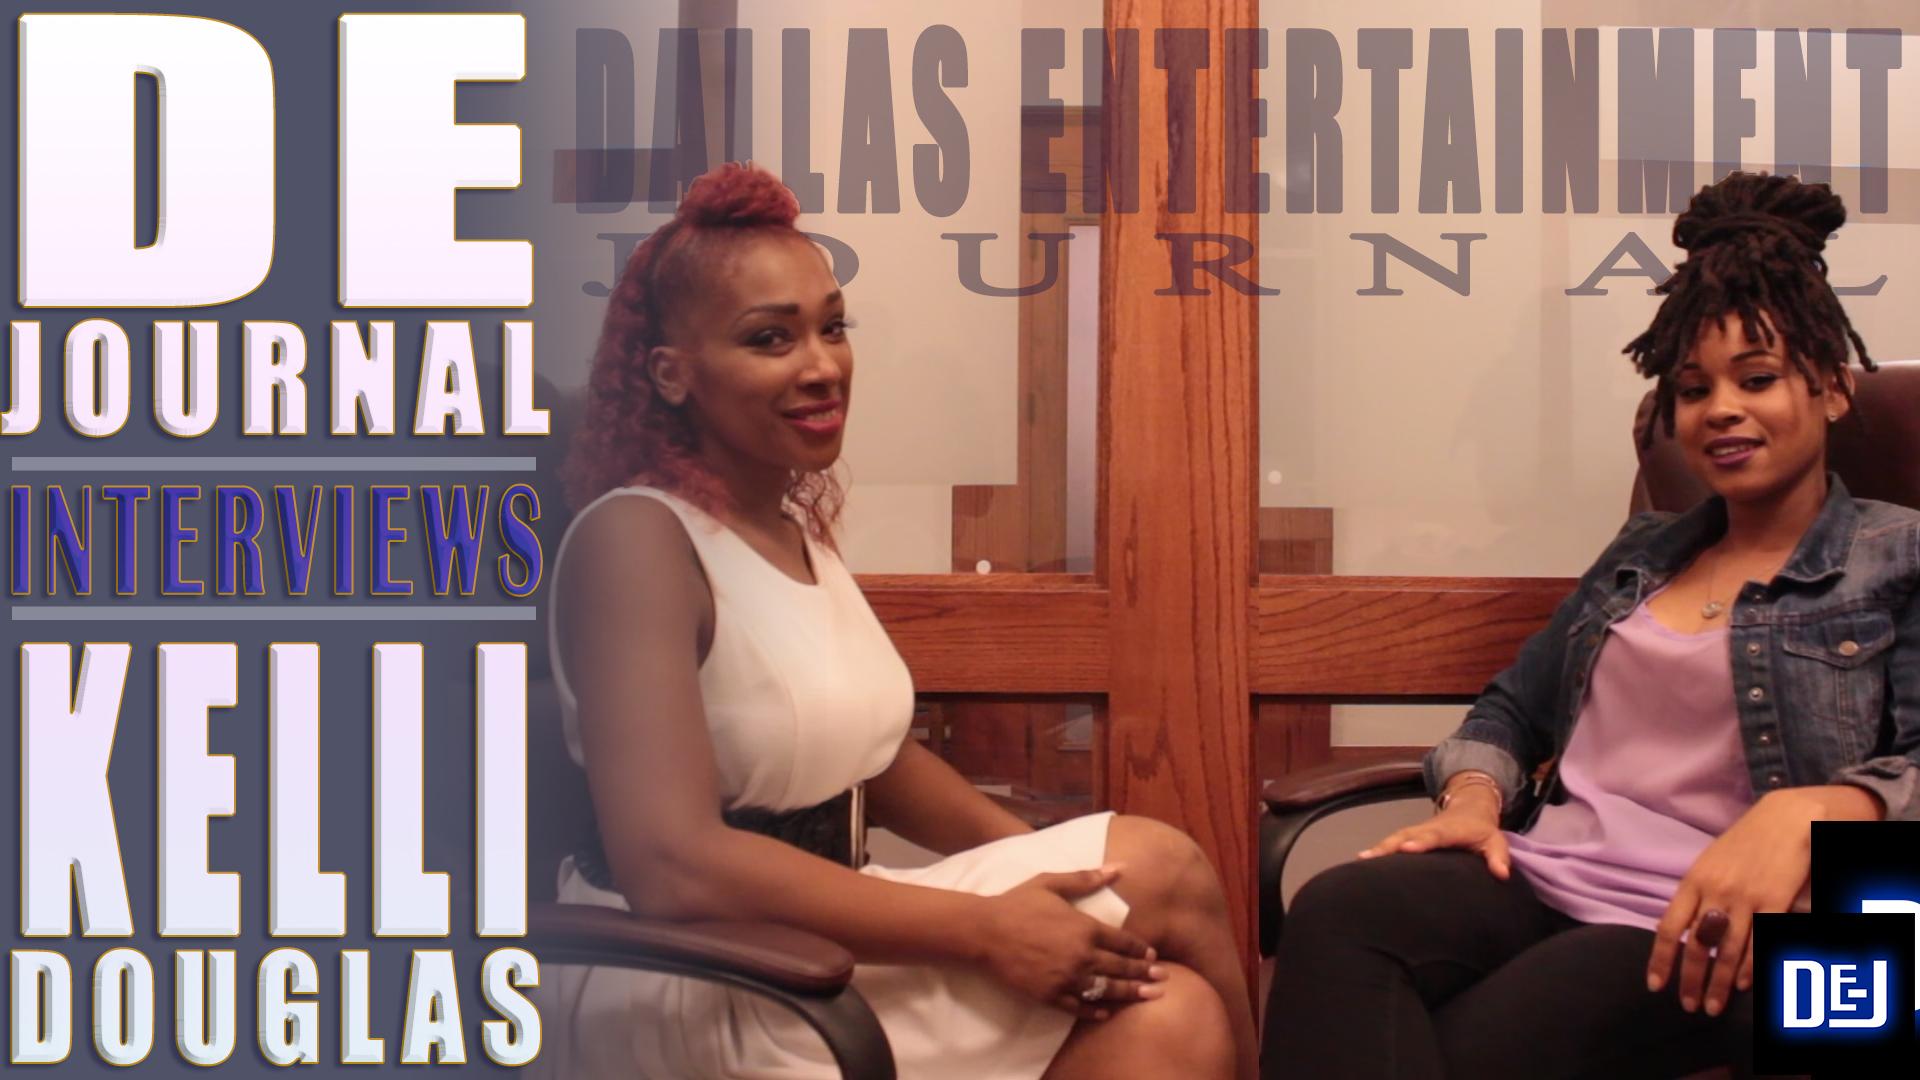 Dallas Entertainment Journal DEJ DE Journal Interviews Kelli Douglas